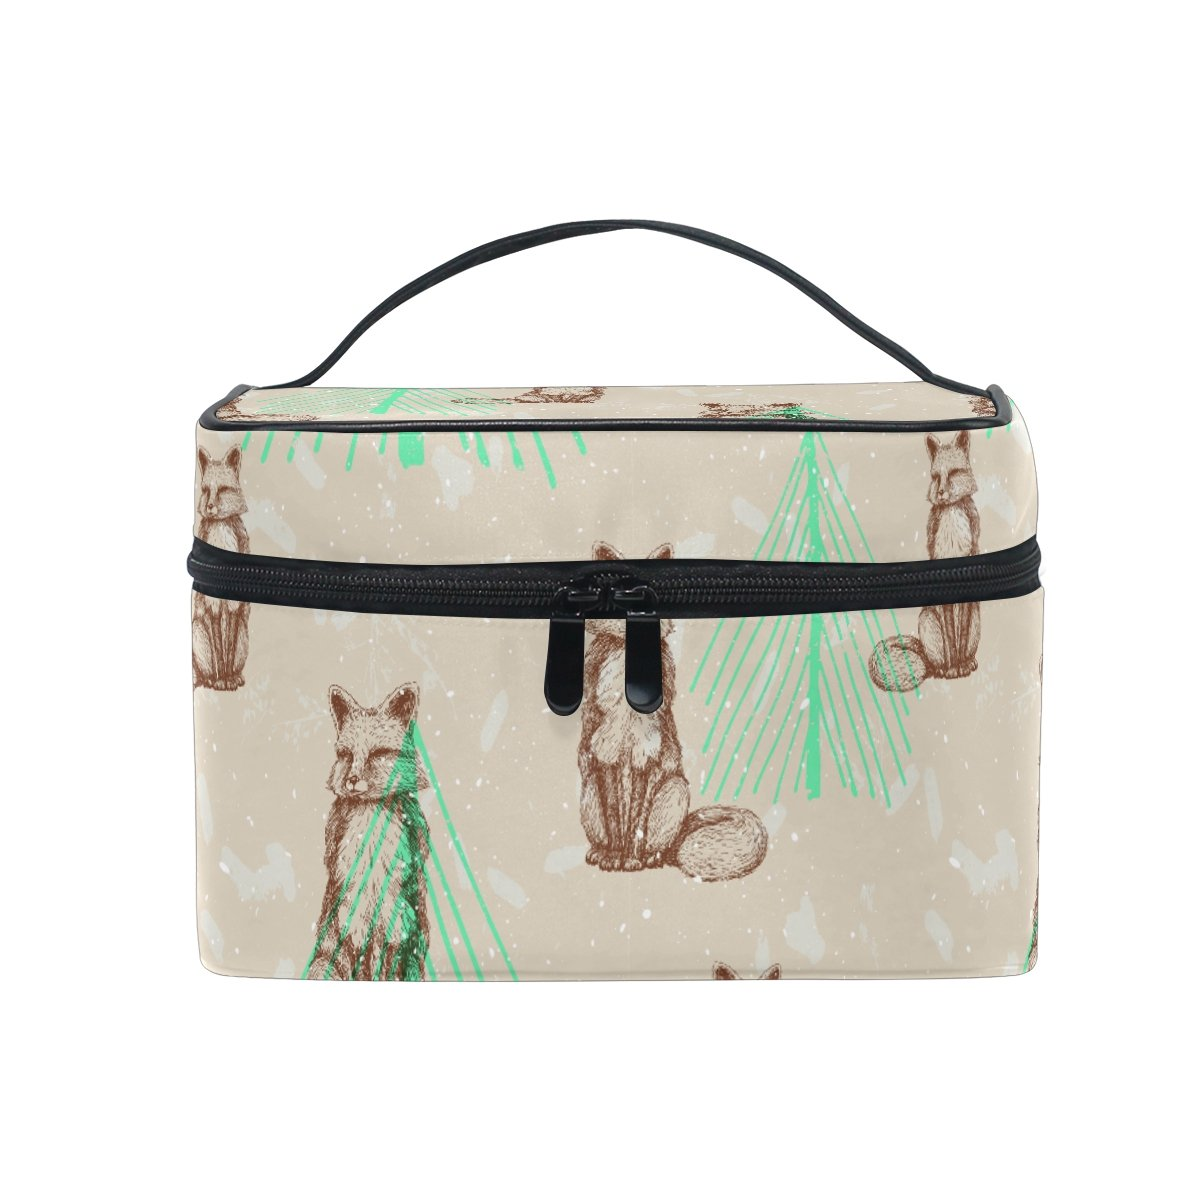 Fox Travel Luggage Storage Bag Duffel Bag Handle Makeup Bag Fashion Lightweight Large Capacity Portable Luggage Bag